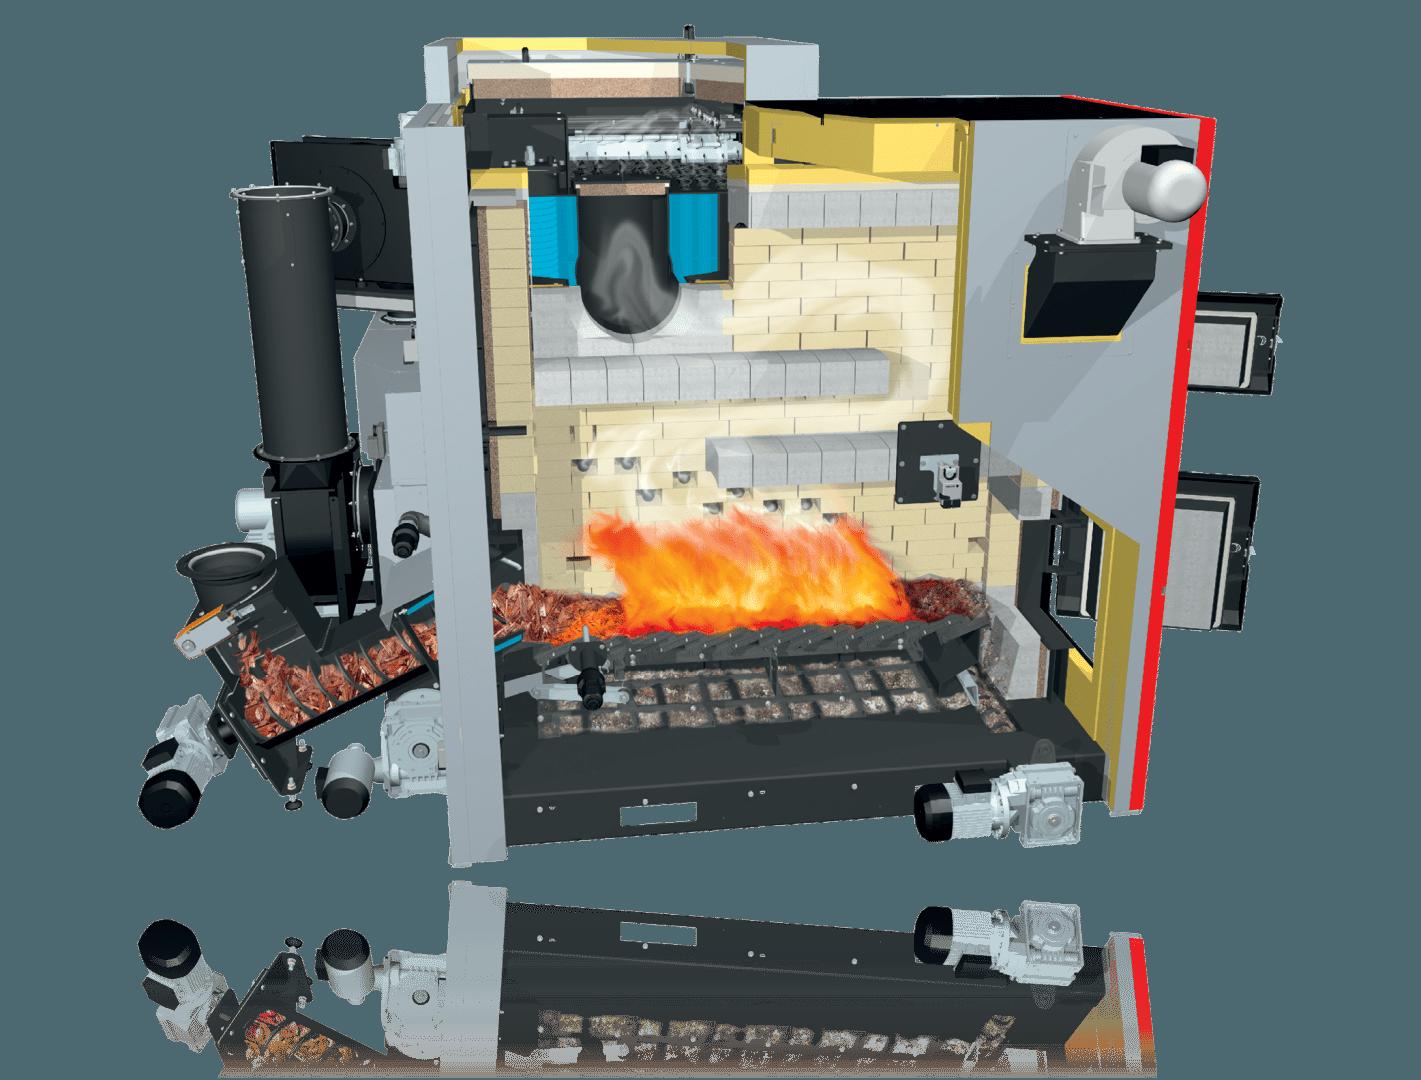 wood chip boiler Fröling TM 500 cross section